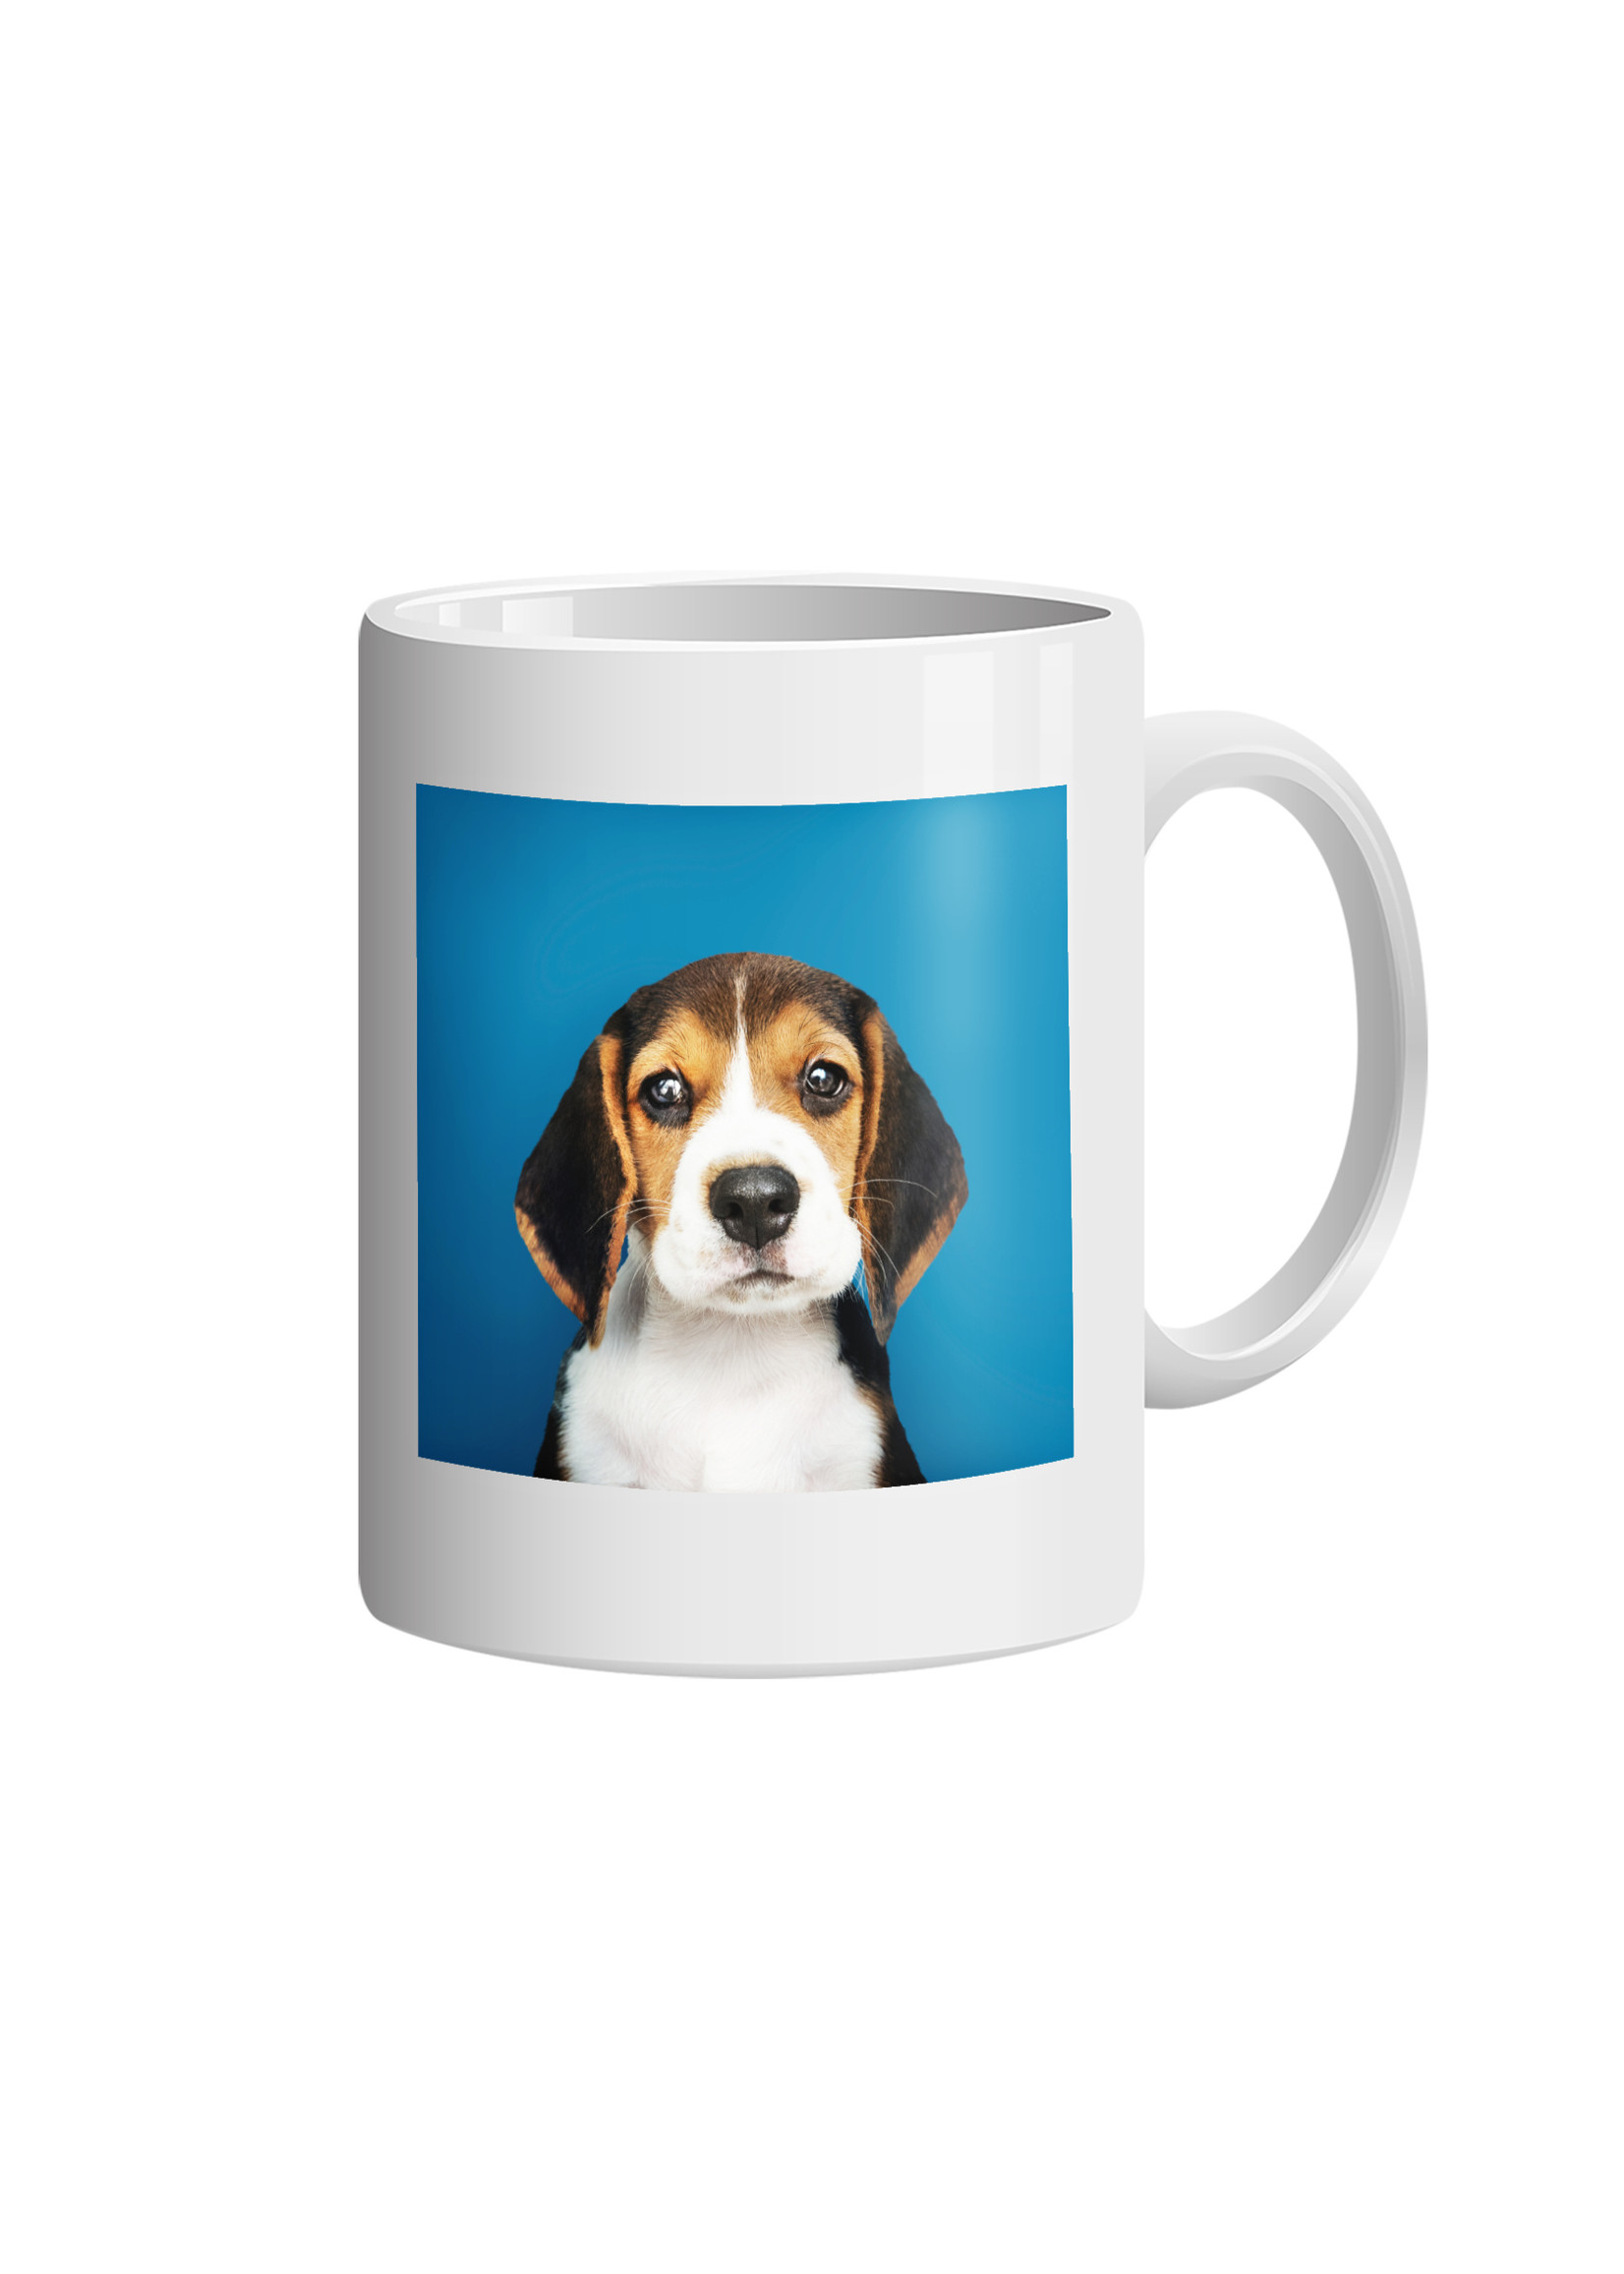 Mok beagle puppy